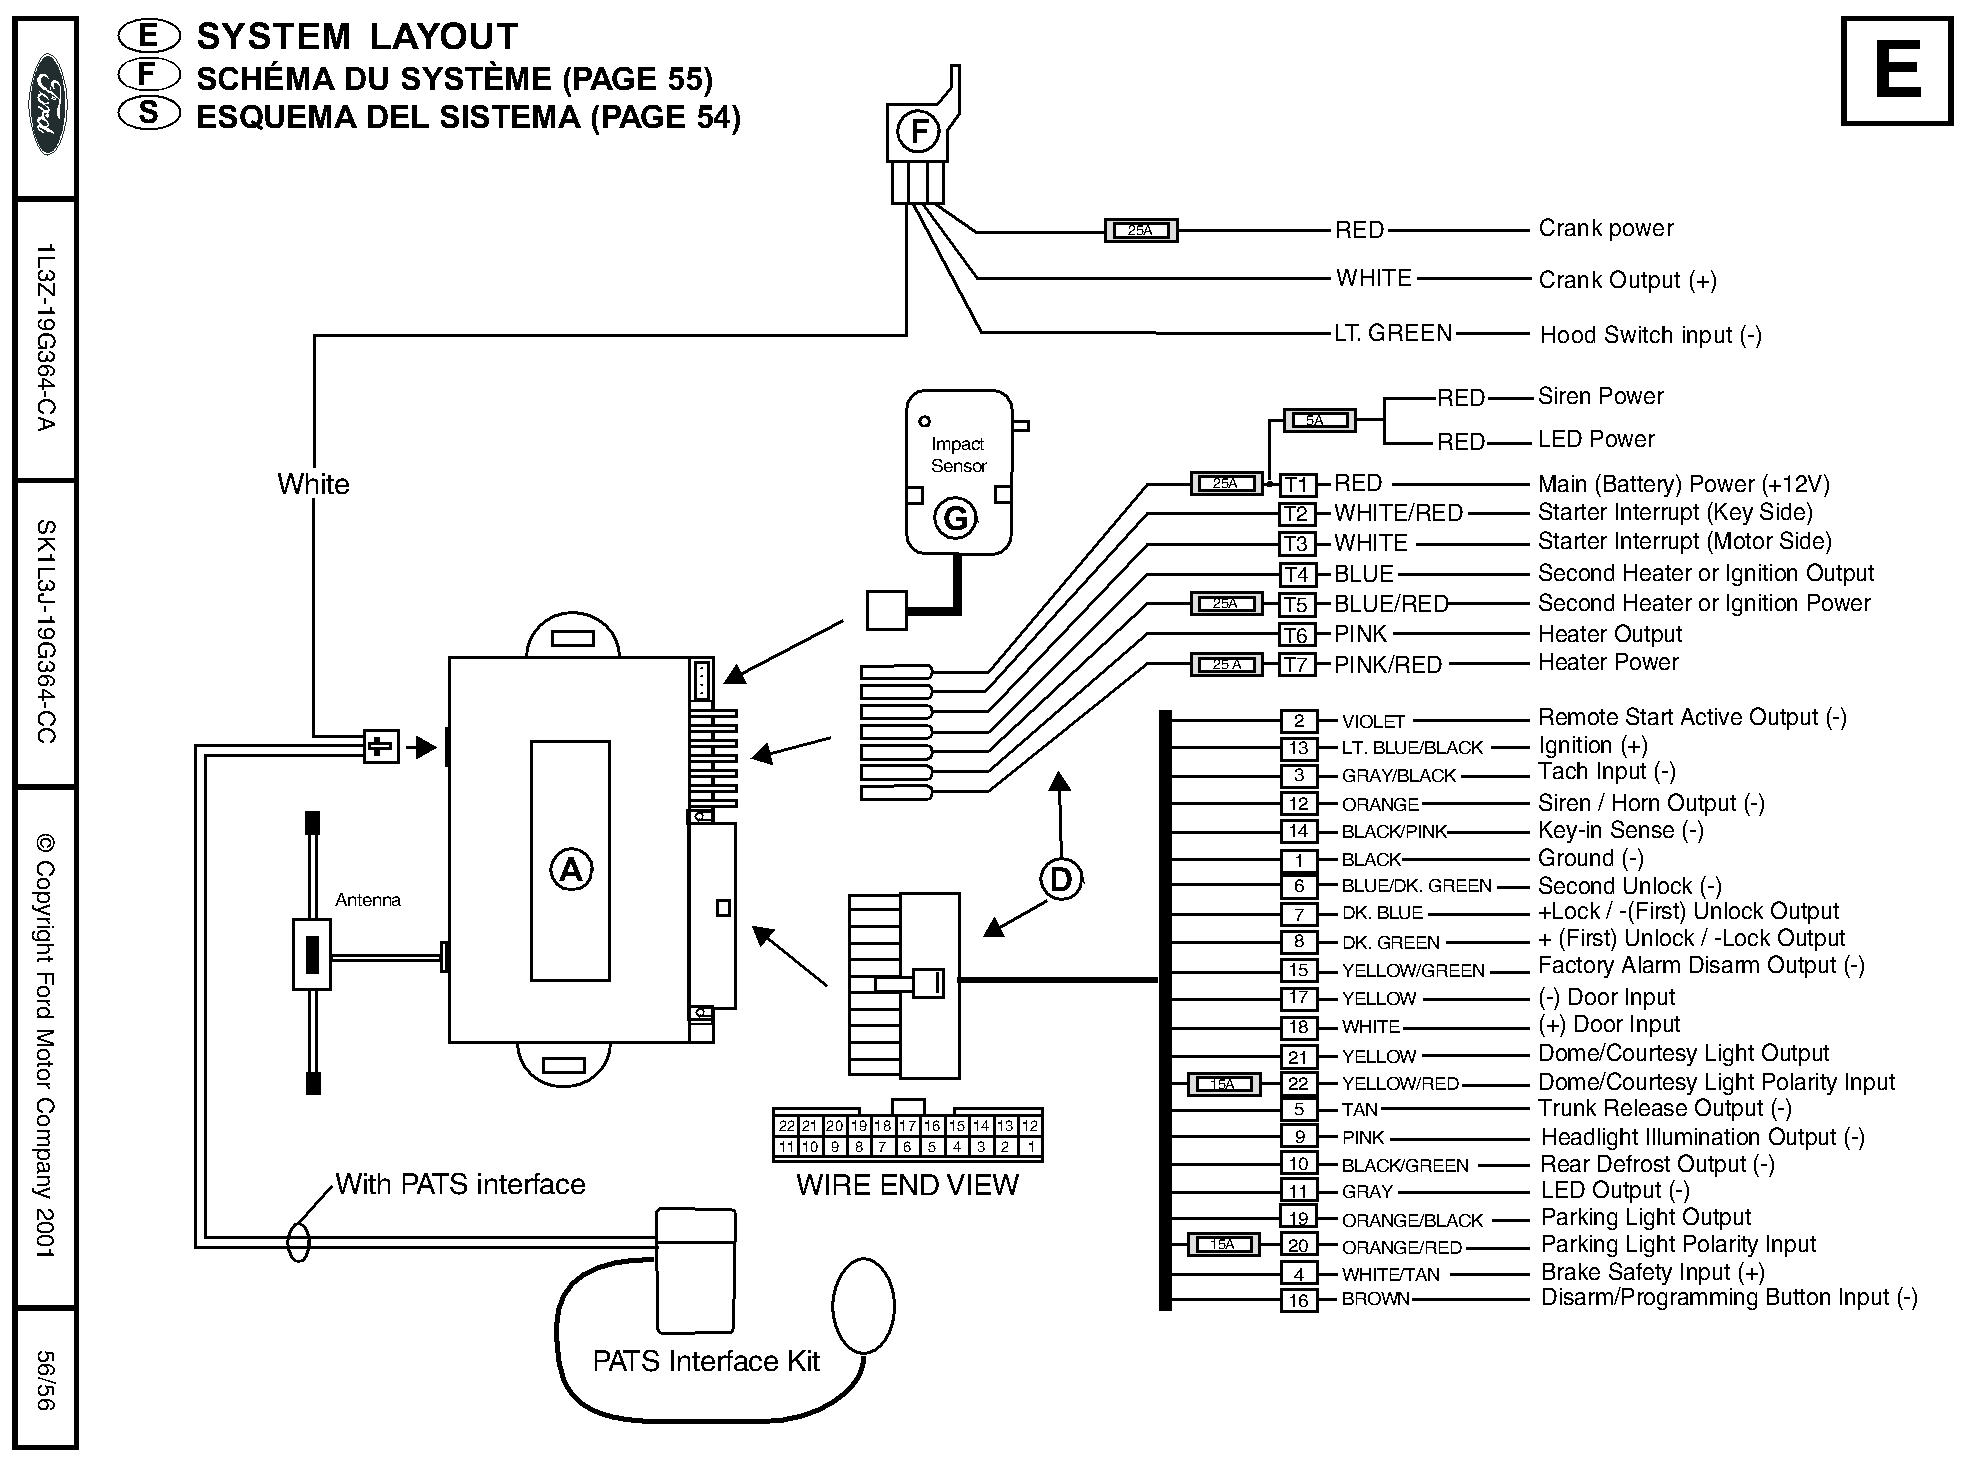 2005 Ford Escape Ke Wiring Diagram Wiring Data \u2022 Ford Escape Parts  Catalog 2005 Ford Escape Antenna Diagram